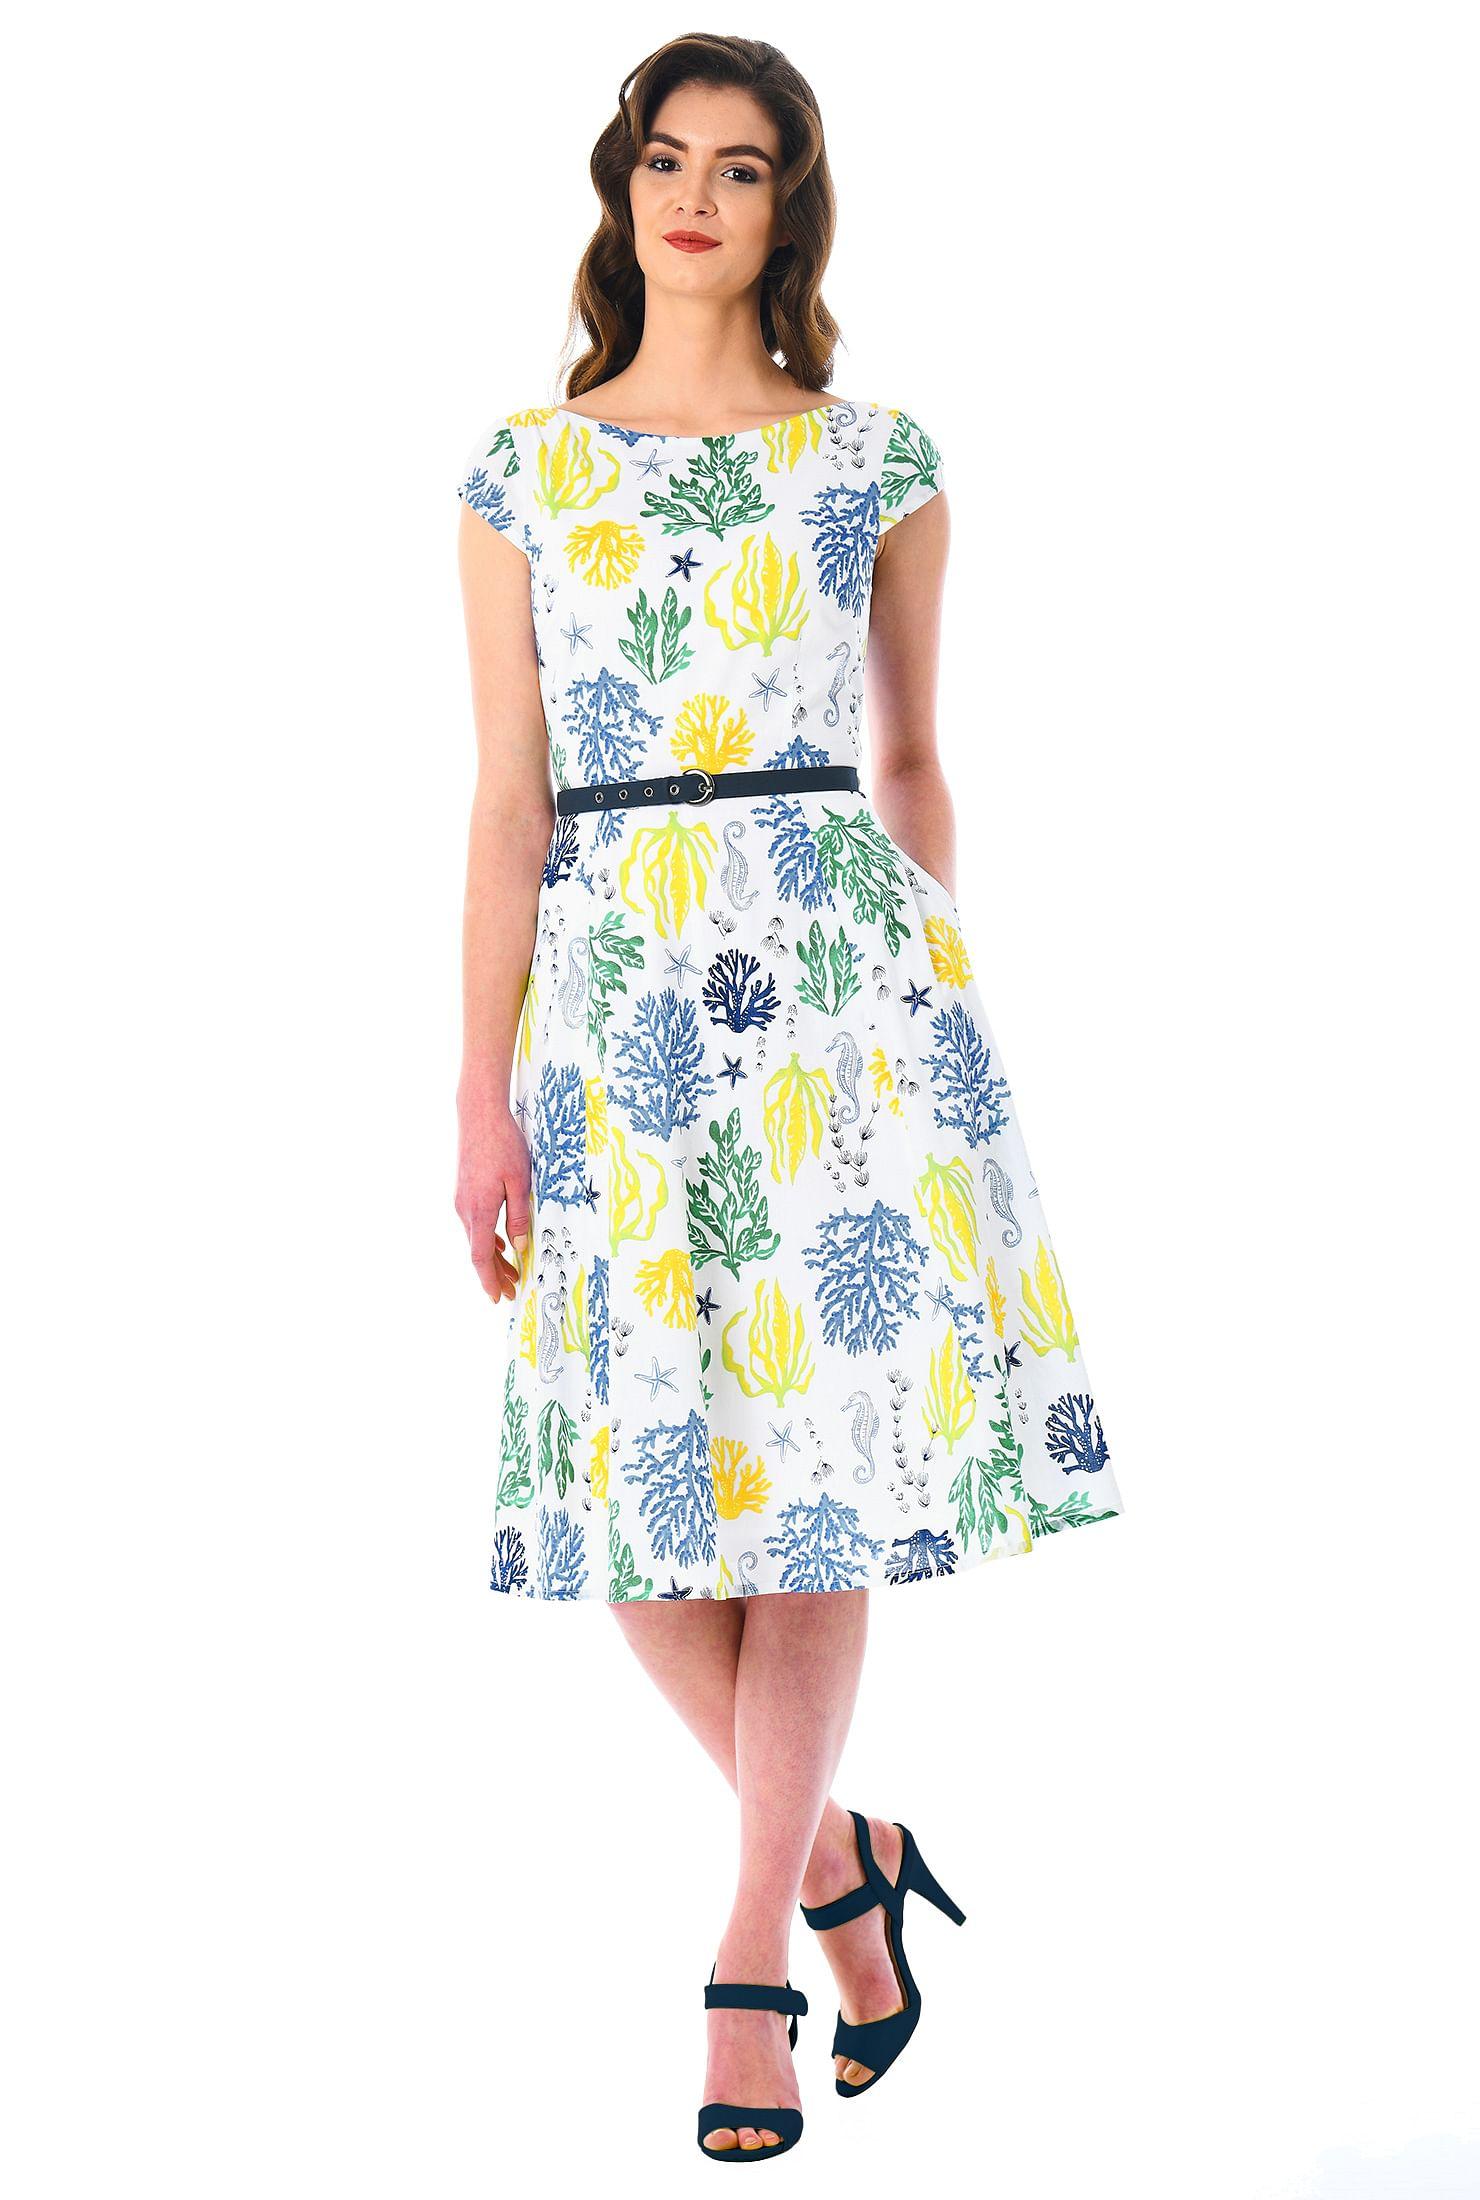 cfb07560c22c back zip dresses, below knee length dresses, boat neck dresses, cap sleeve